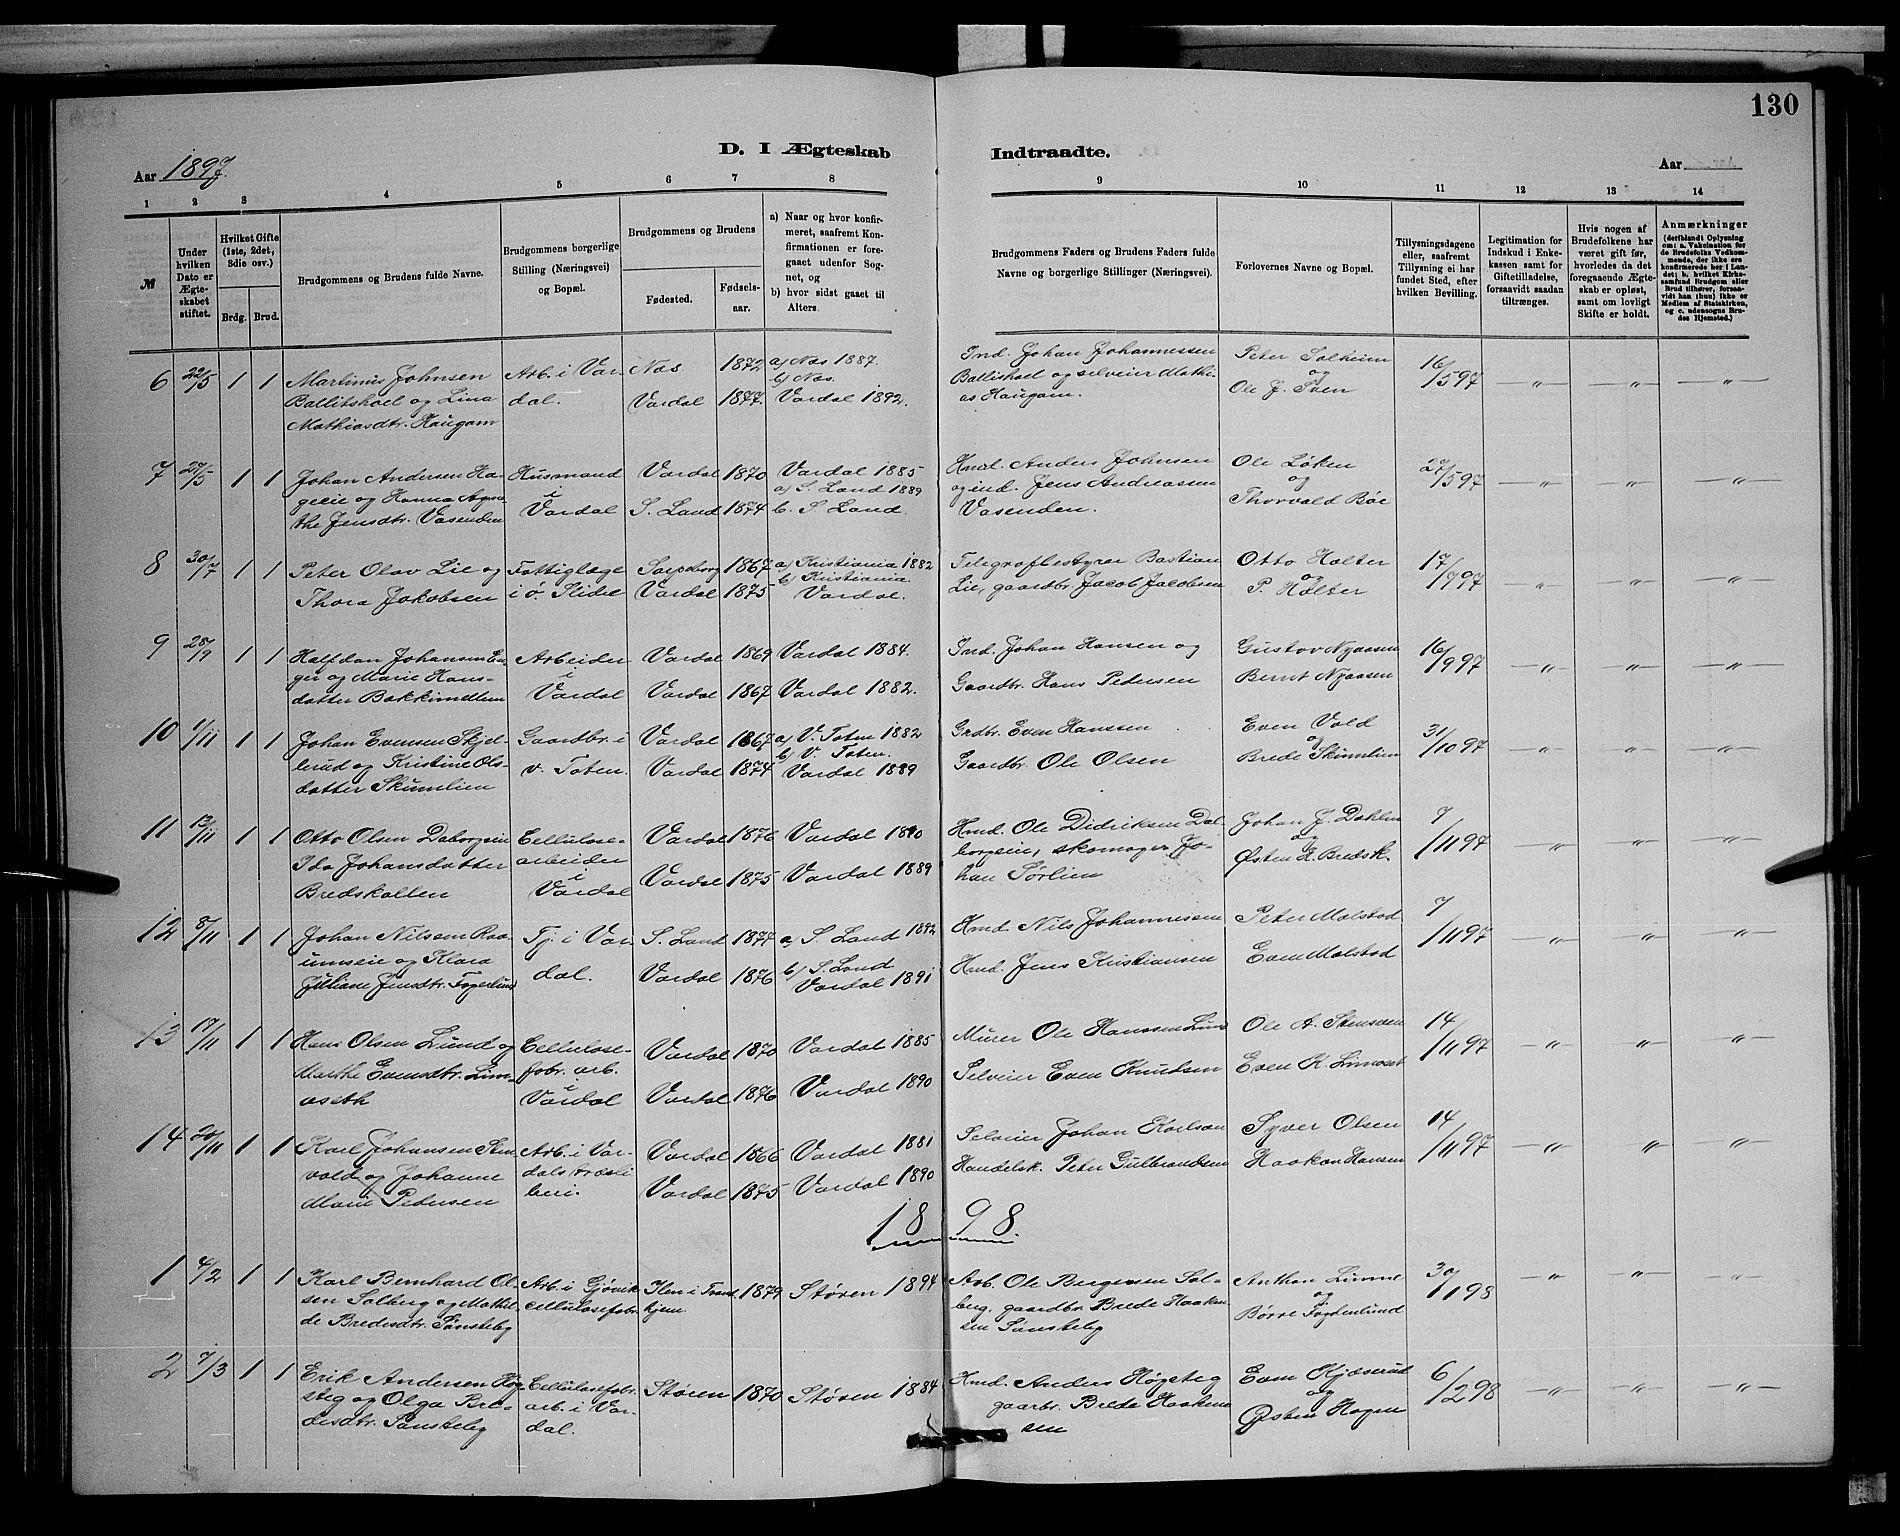 SAH, Vardal prestekontor, H/Ha/Hab/L0008: Klokkerbok nr. 8, 1881-1898, s. 130